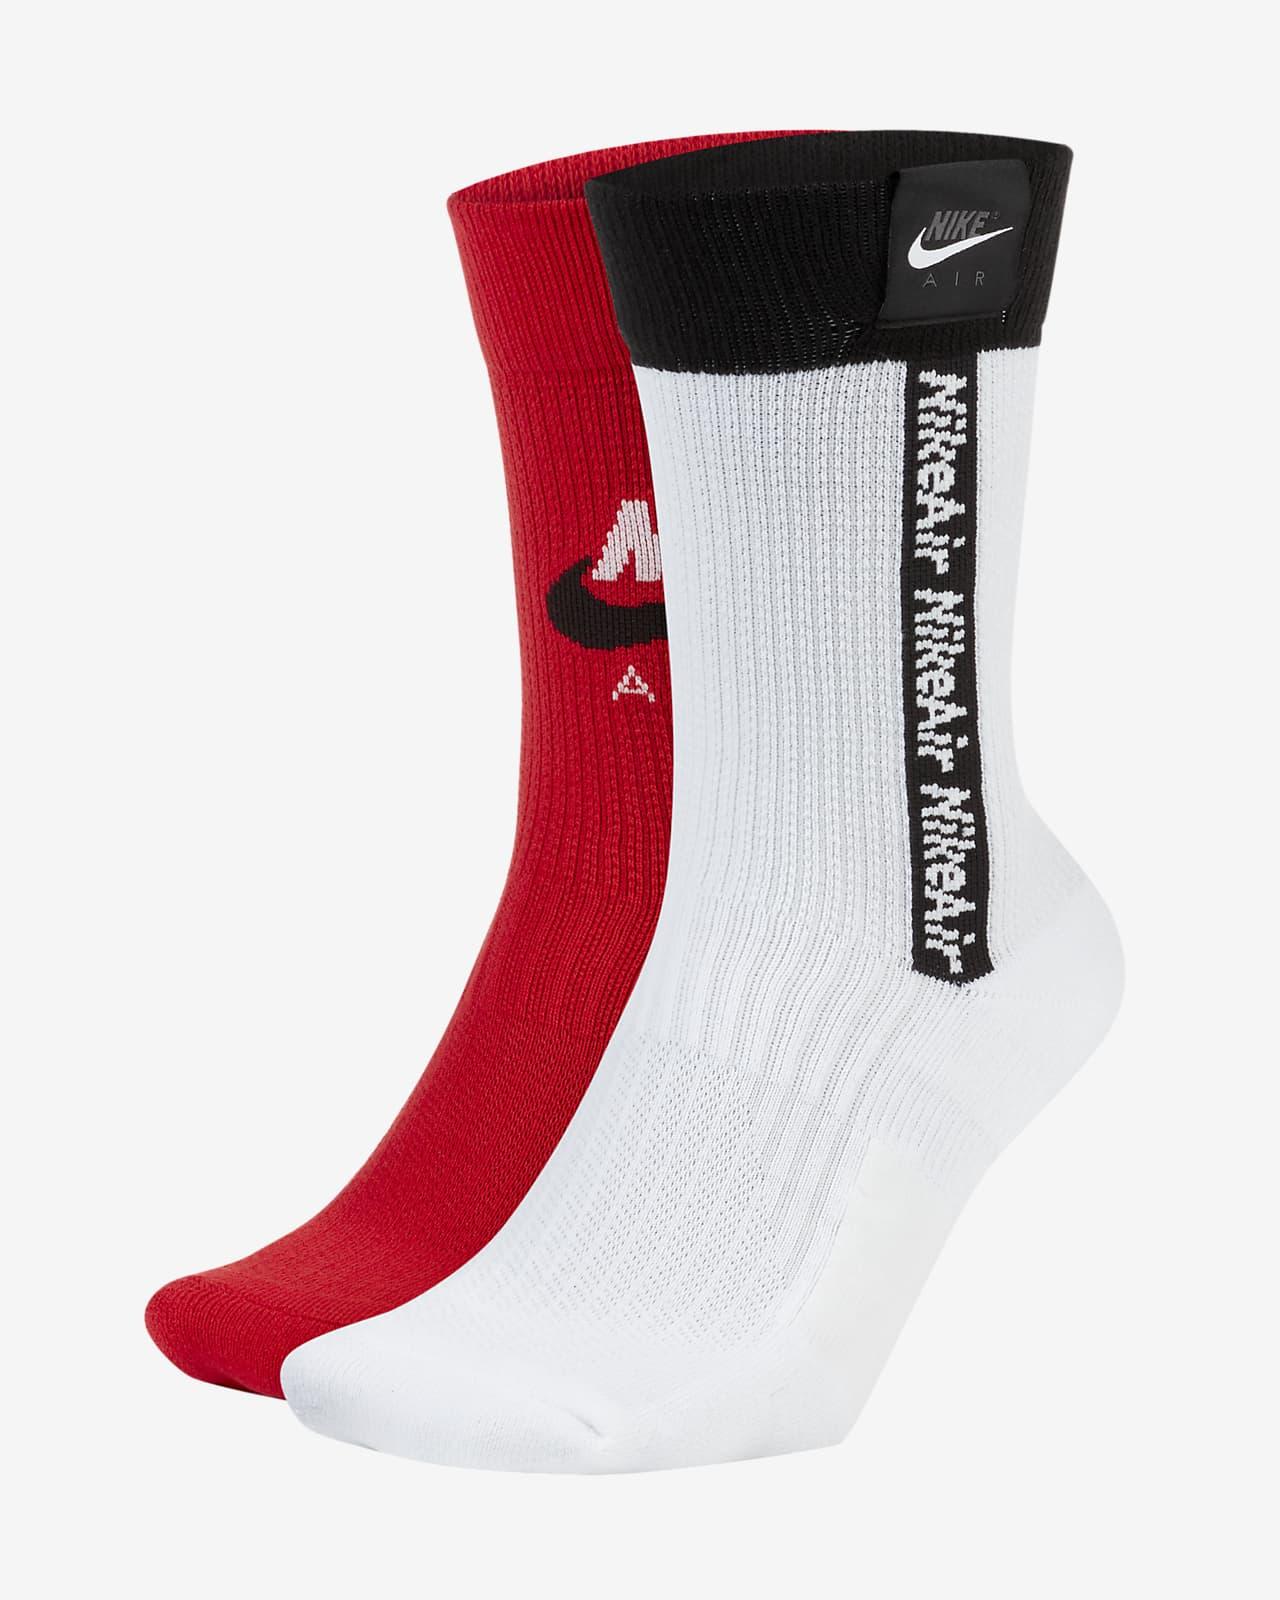 Nike Air SNEAKR SOX Crew Socks (2 Pairs)